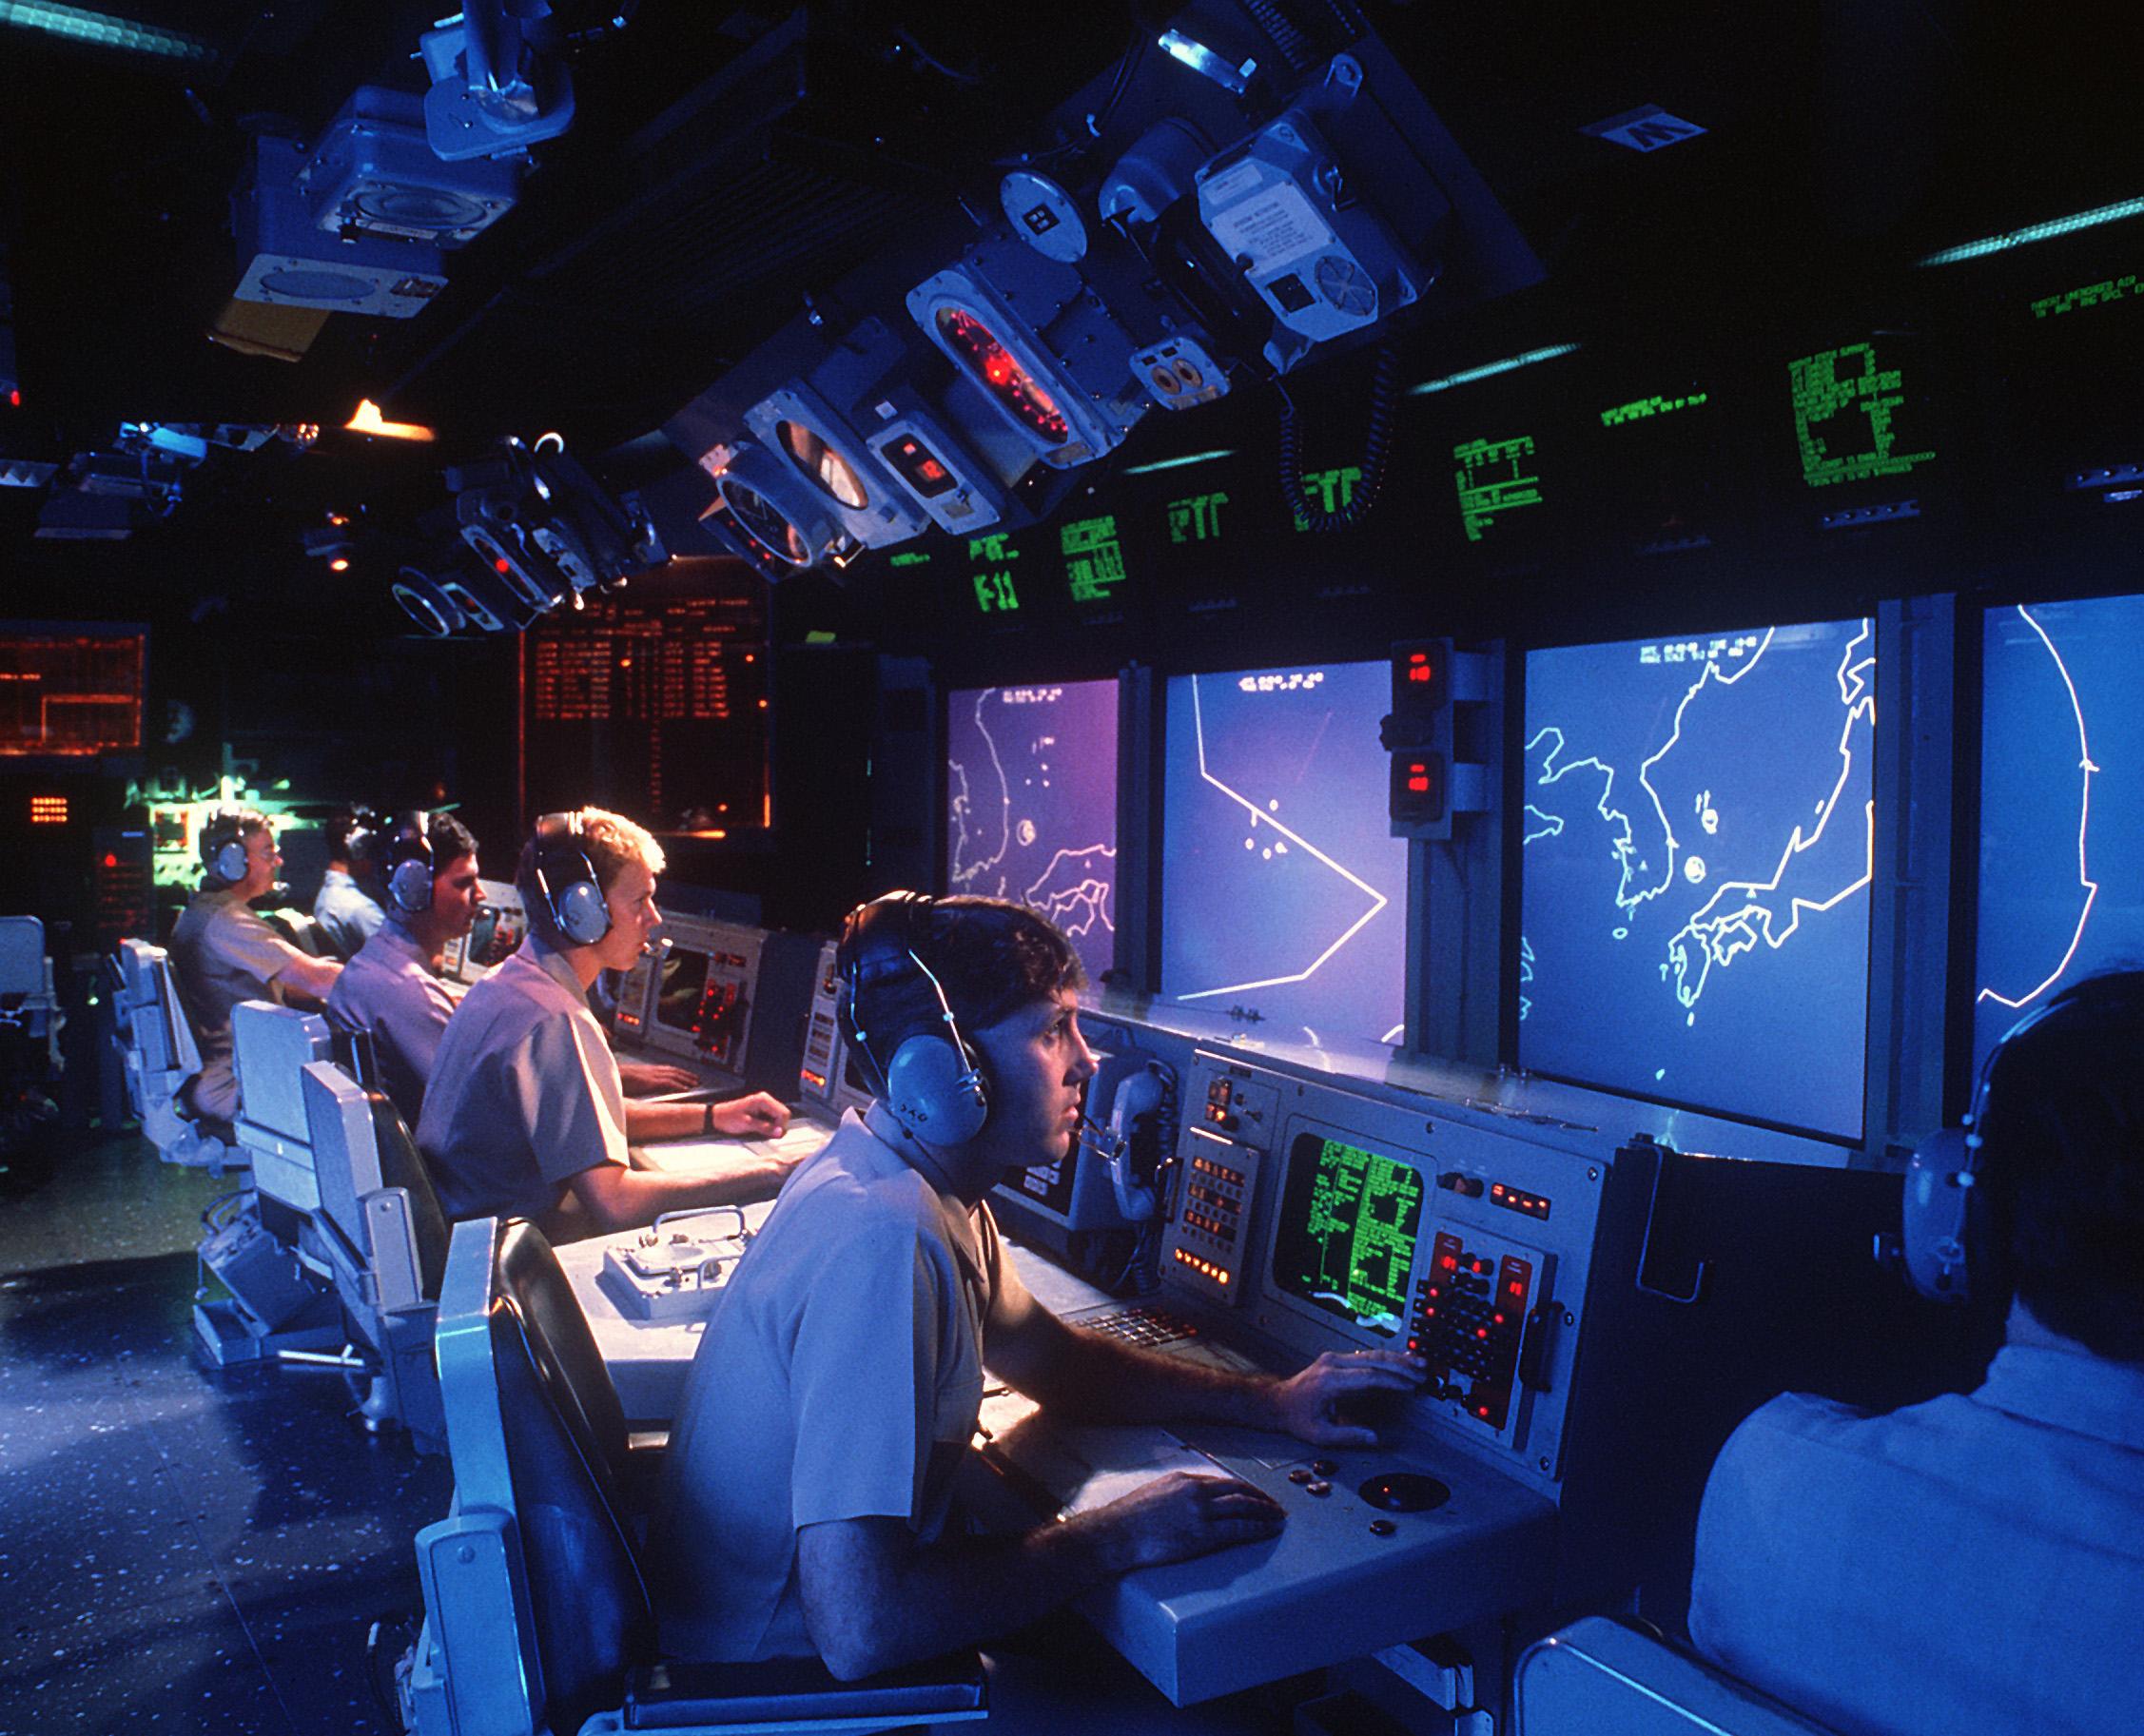 Aegis_USS_Vincennes_(CG-49)_Aegis_large_screen_displays.jpg